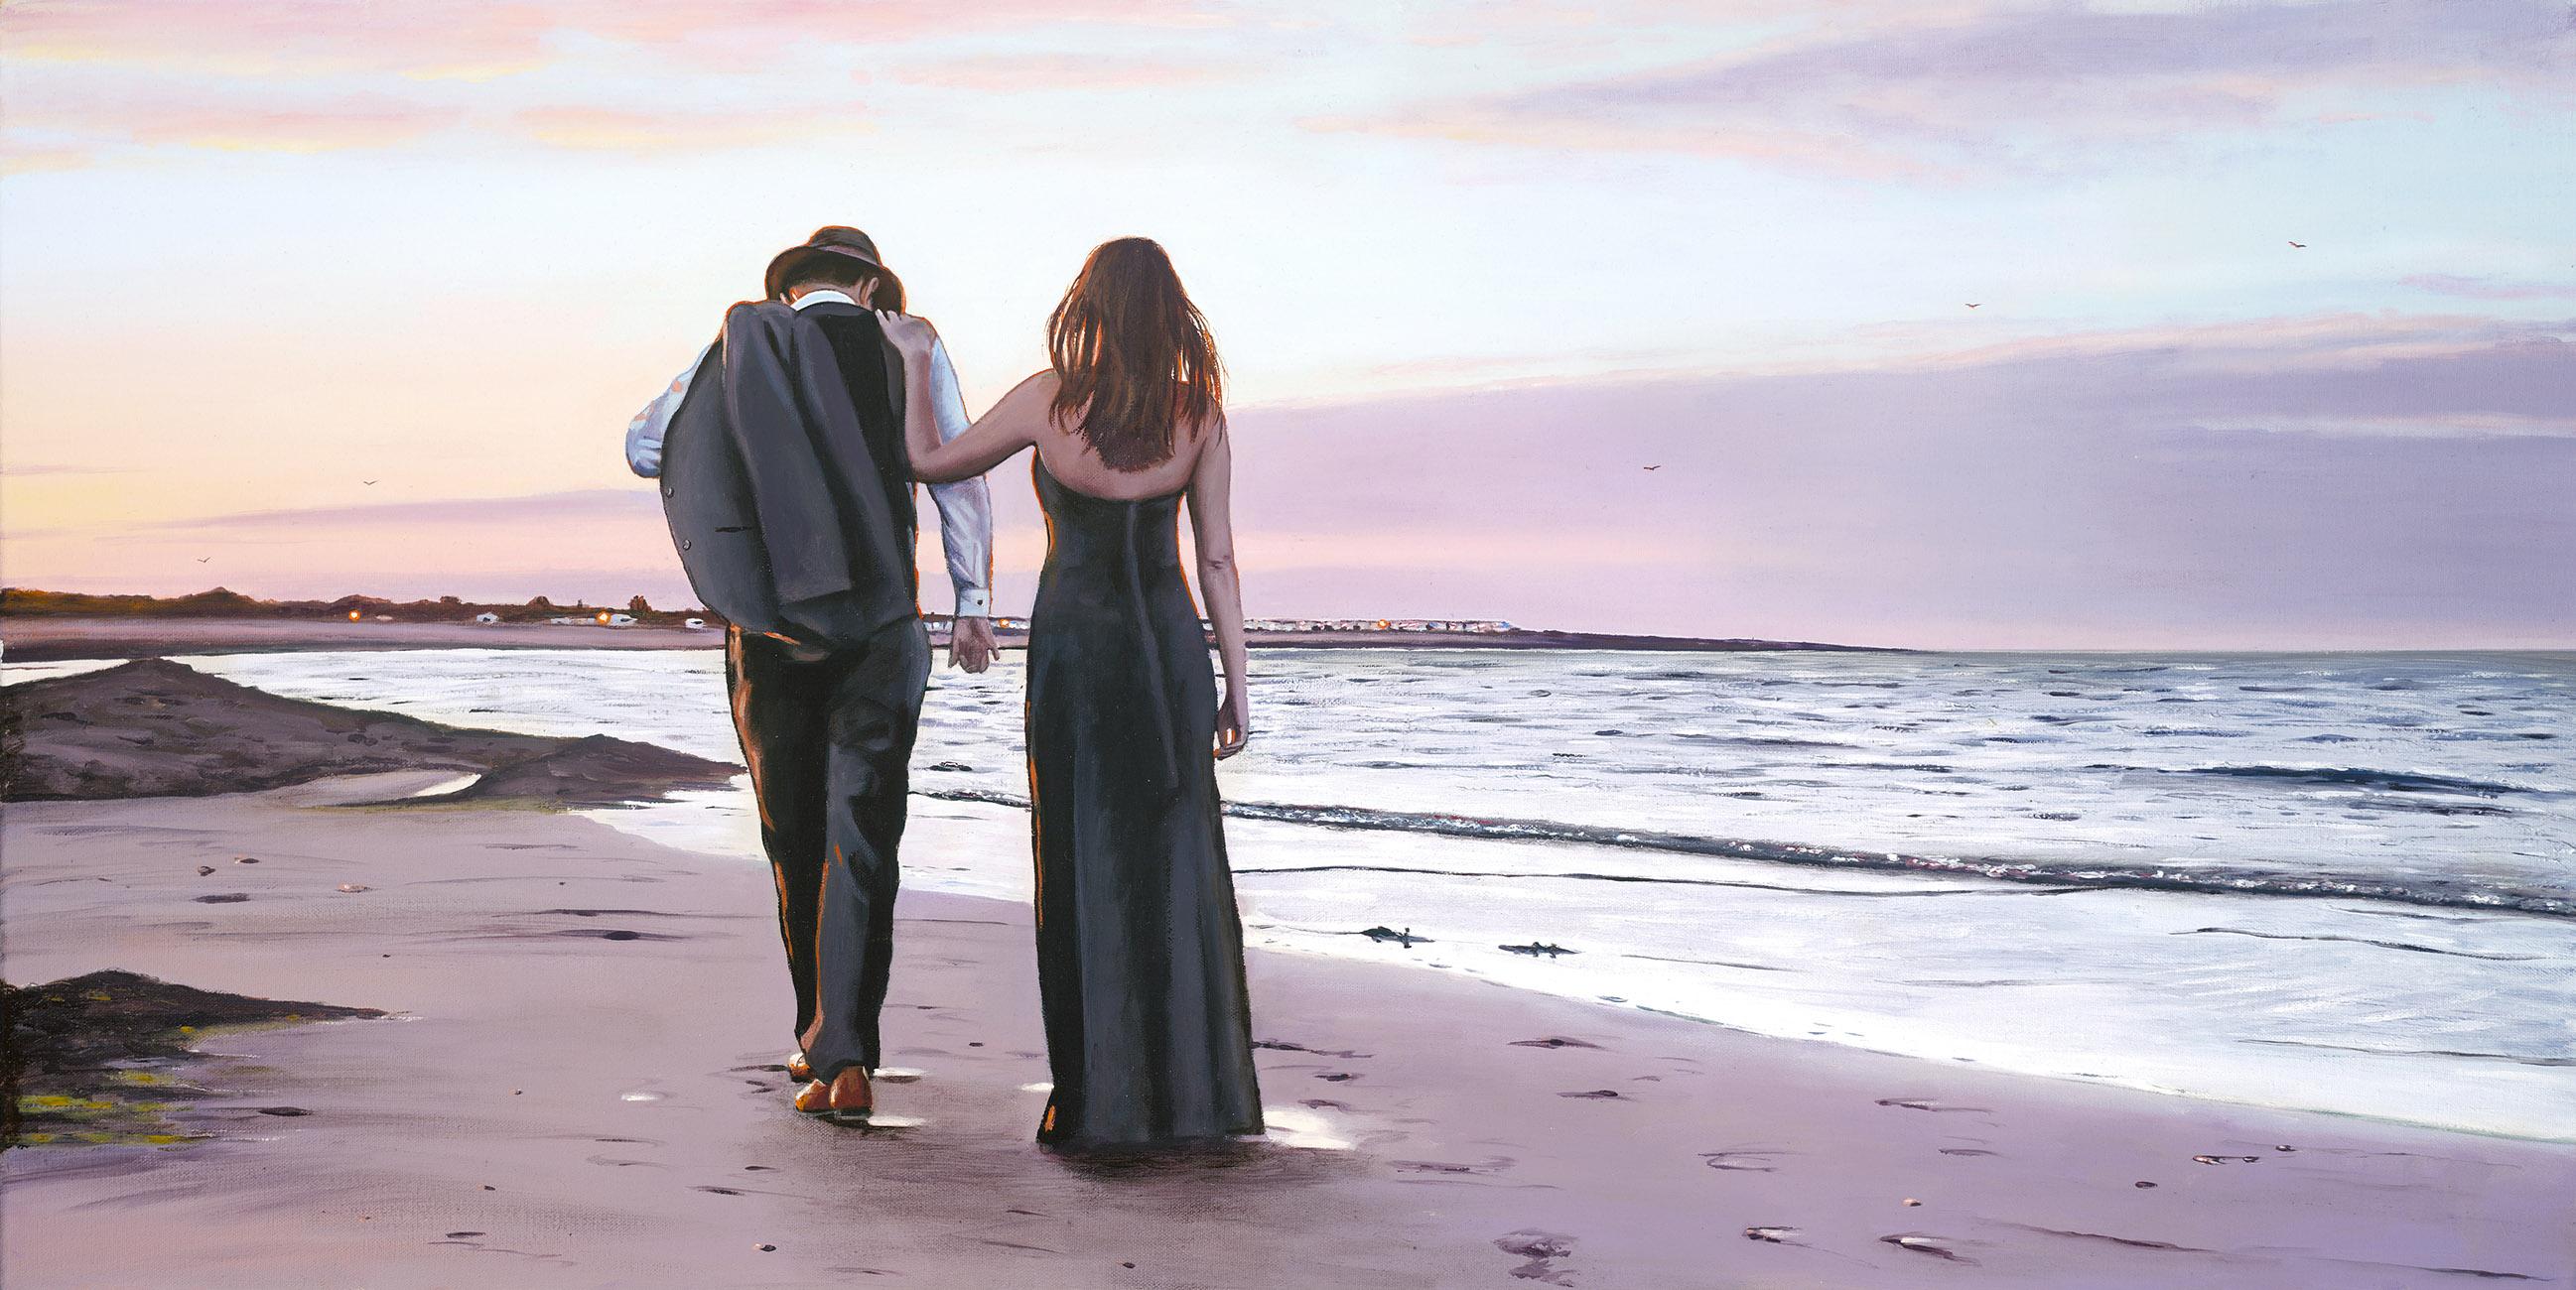 Sunset Sands by Richard Blunt